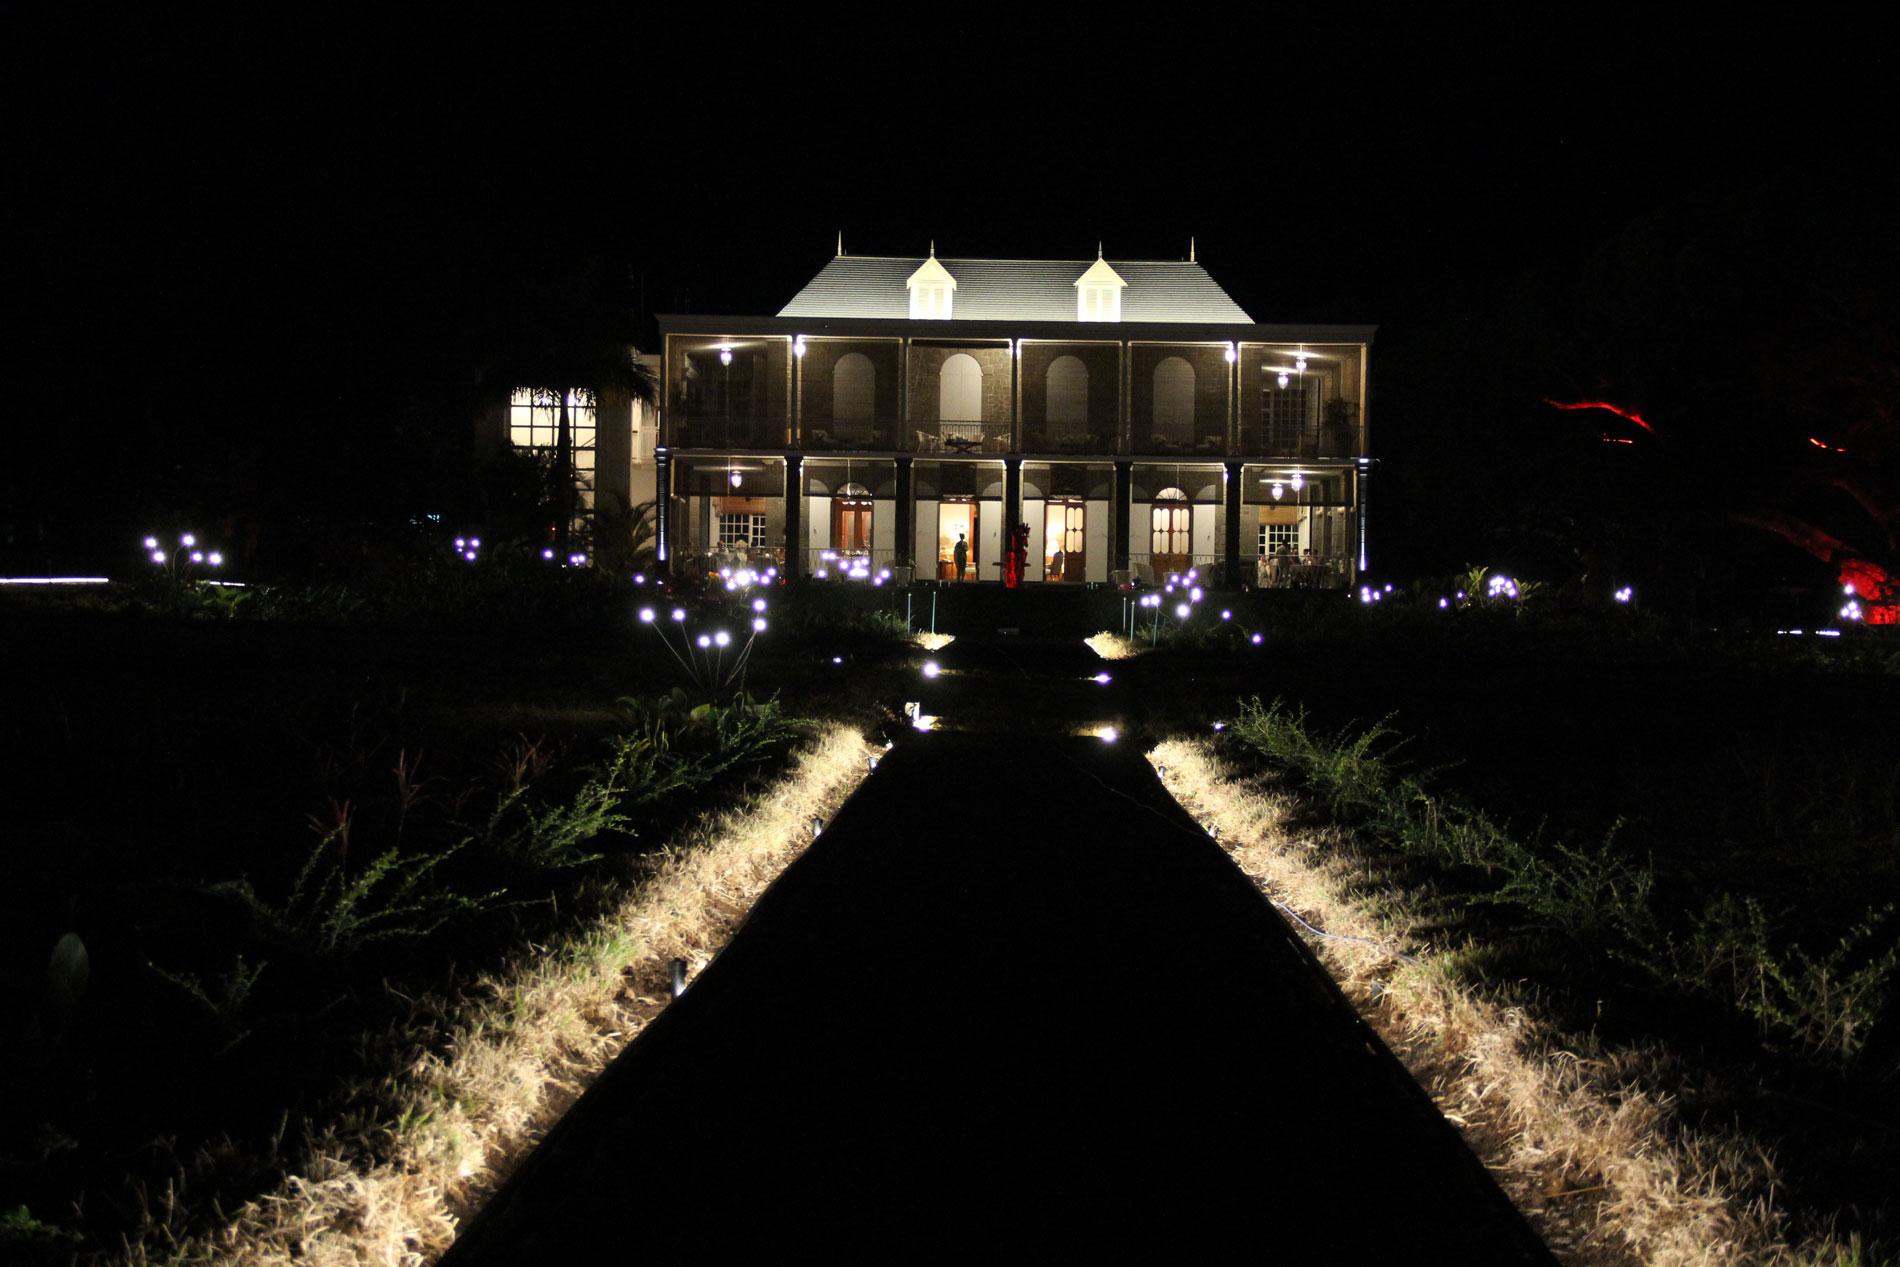 Frederic-Poite-Lighting-Designer-Hotel-Heritage-Le-Telfair-Bel-Ombre-Ile-Maurice